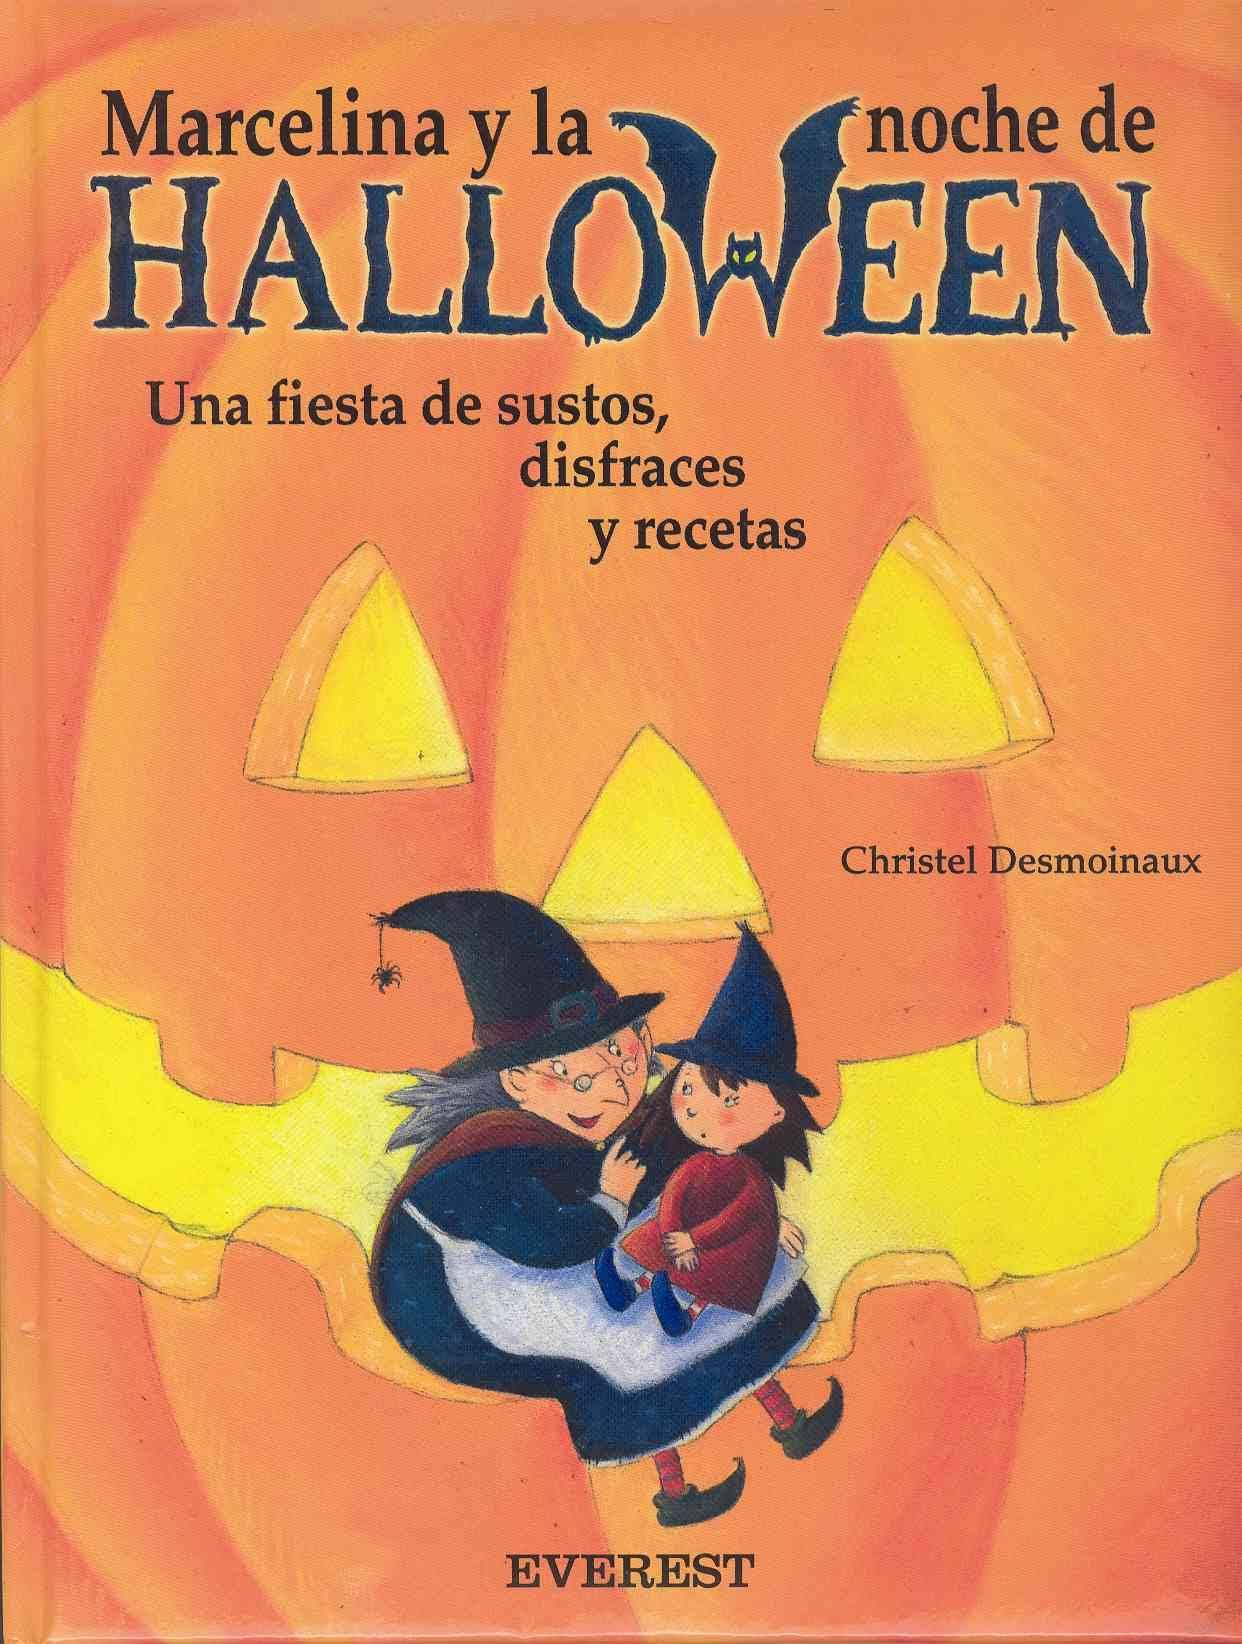 libros noche de halloween